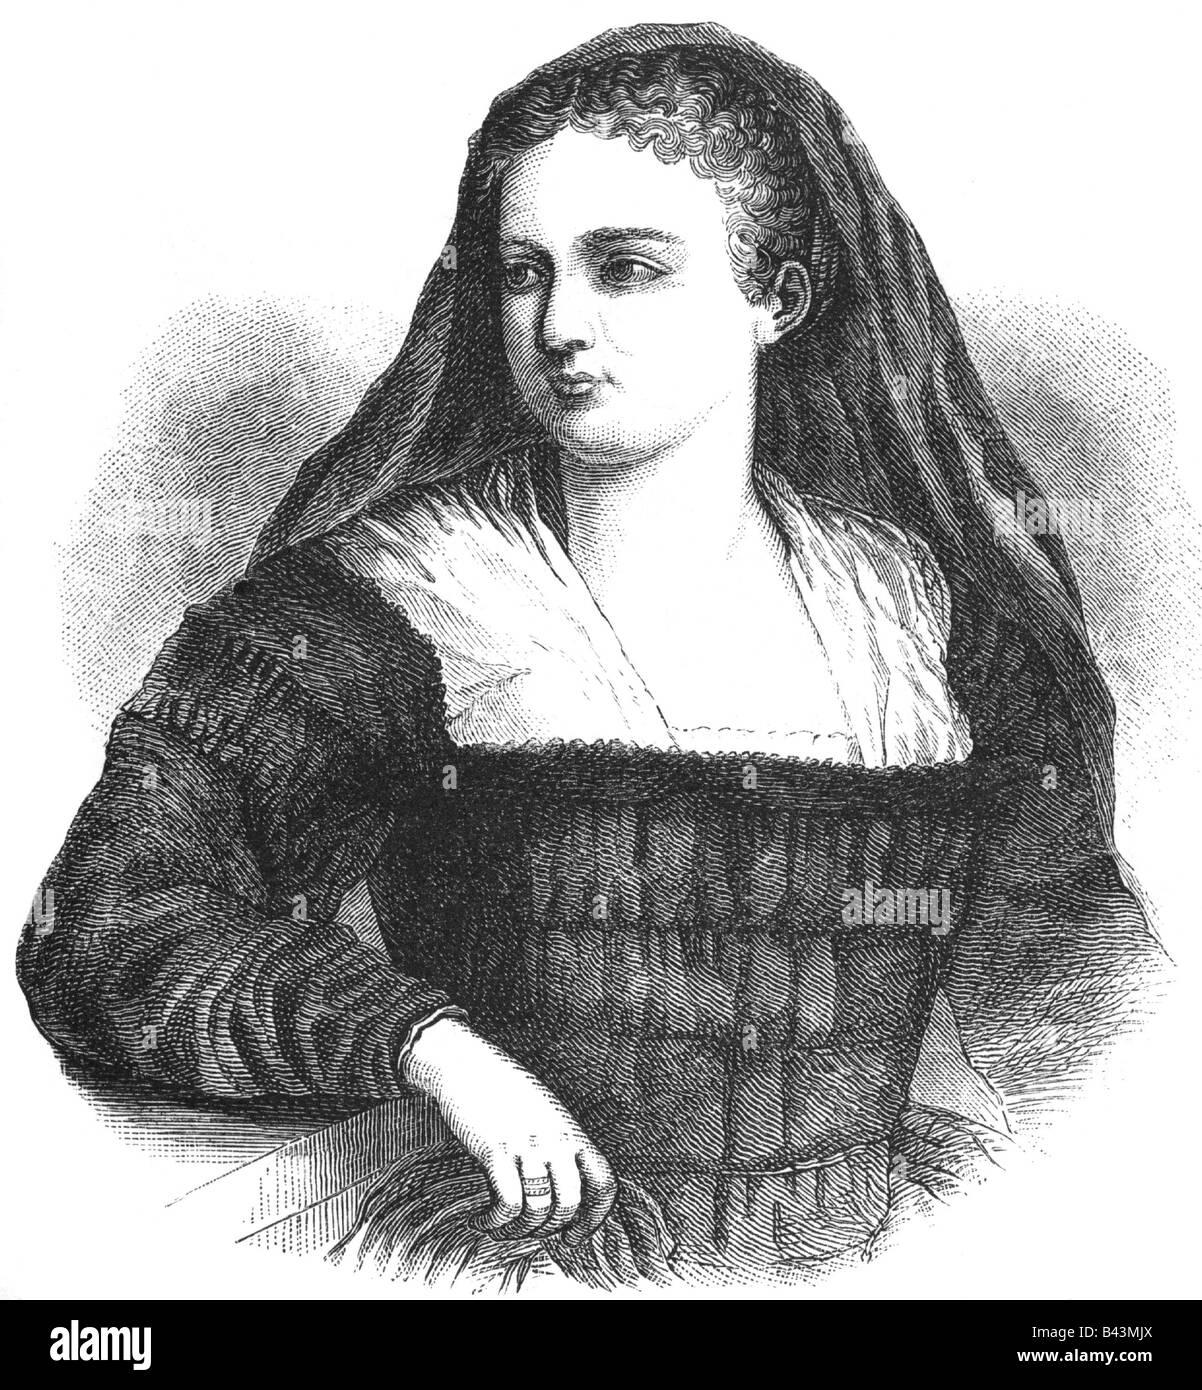 Cornaro, Catarina, 25.11.1454 - 10.7.1510, Queen on Jerusalem, Armenia and Cyprus 1474 - 1489,  wood engraving, - Stock Image